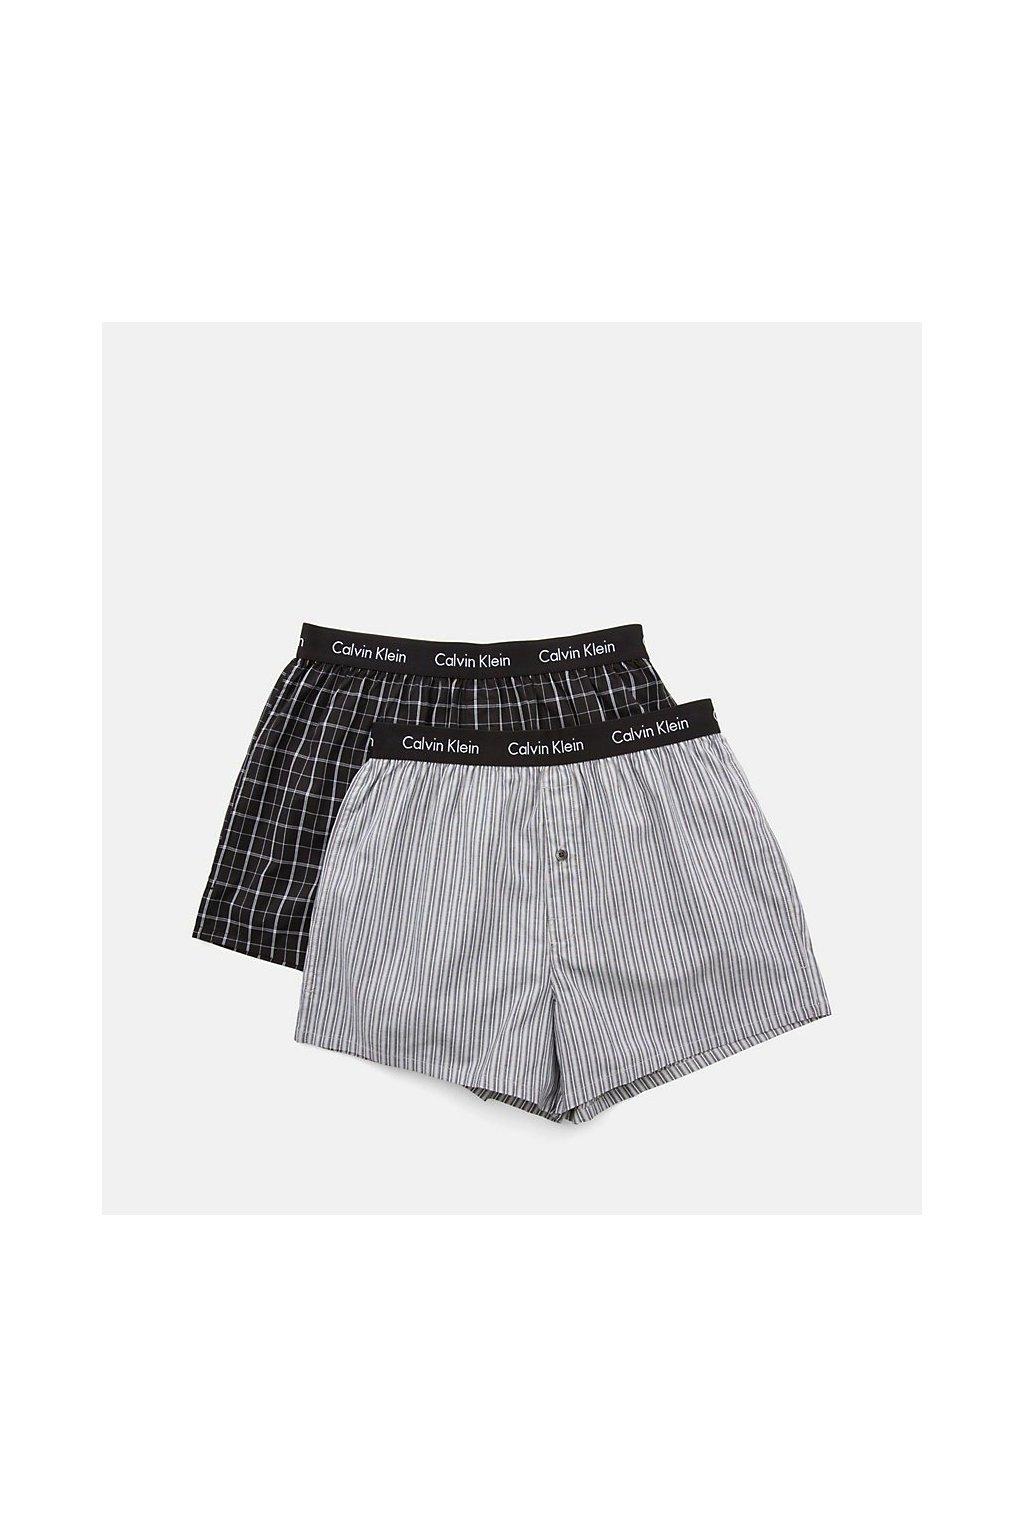 Calvin Klein 2Pack Trenky Černé Se Vzory